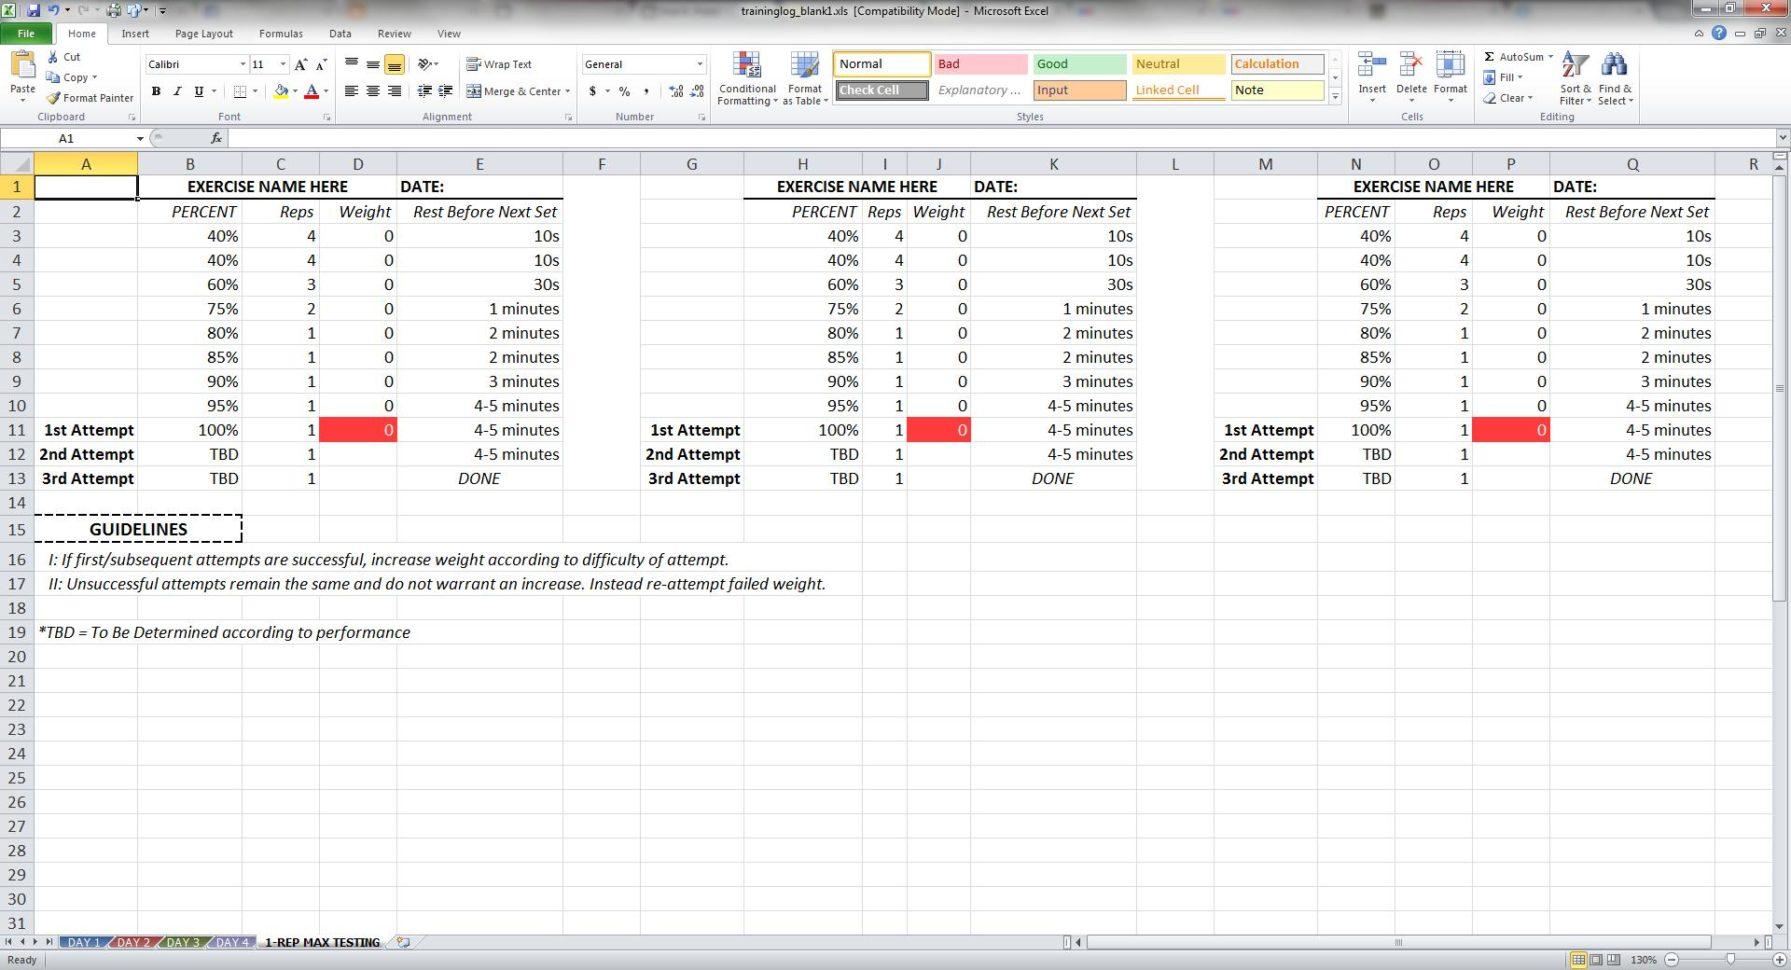 Employee Training Tracking Software